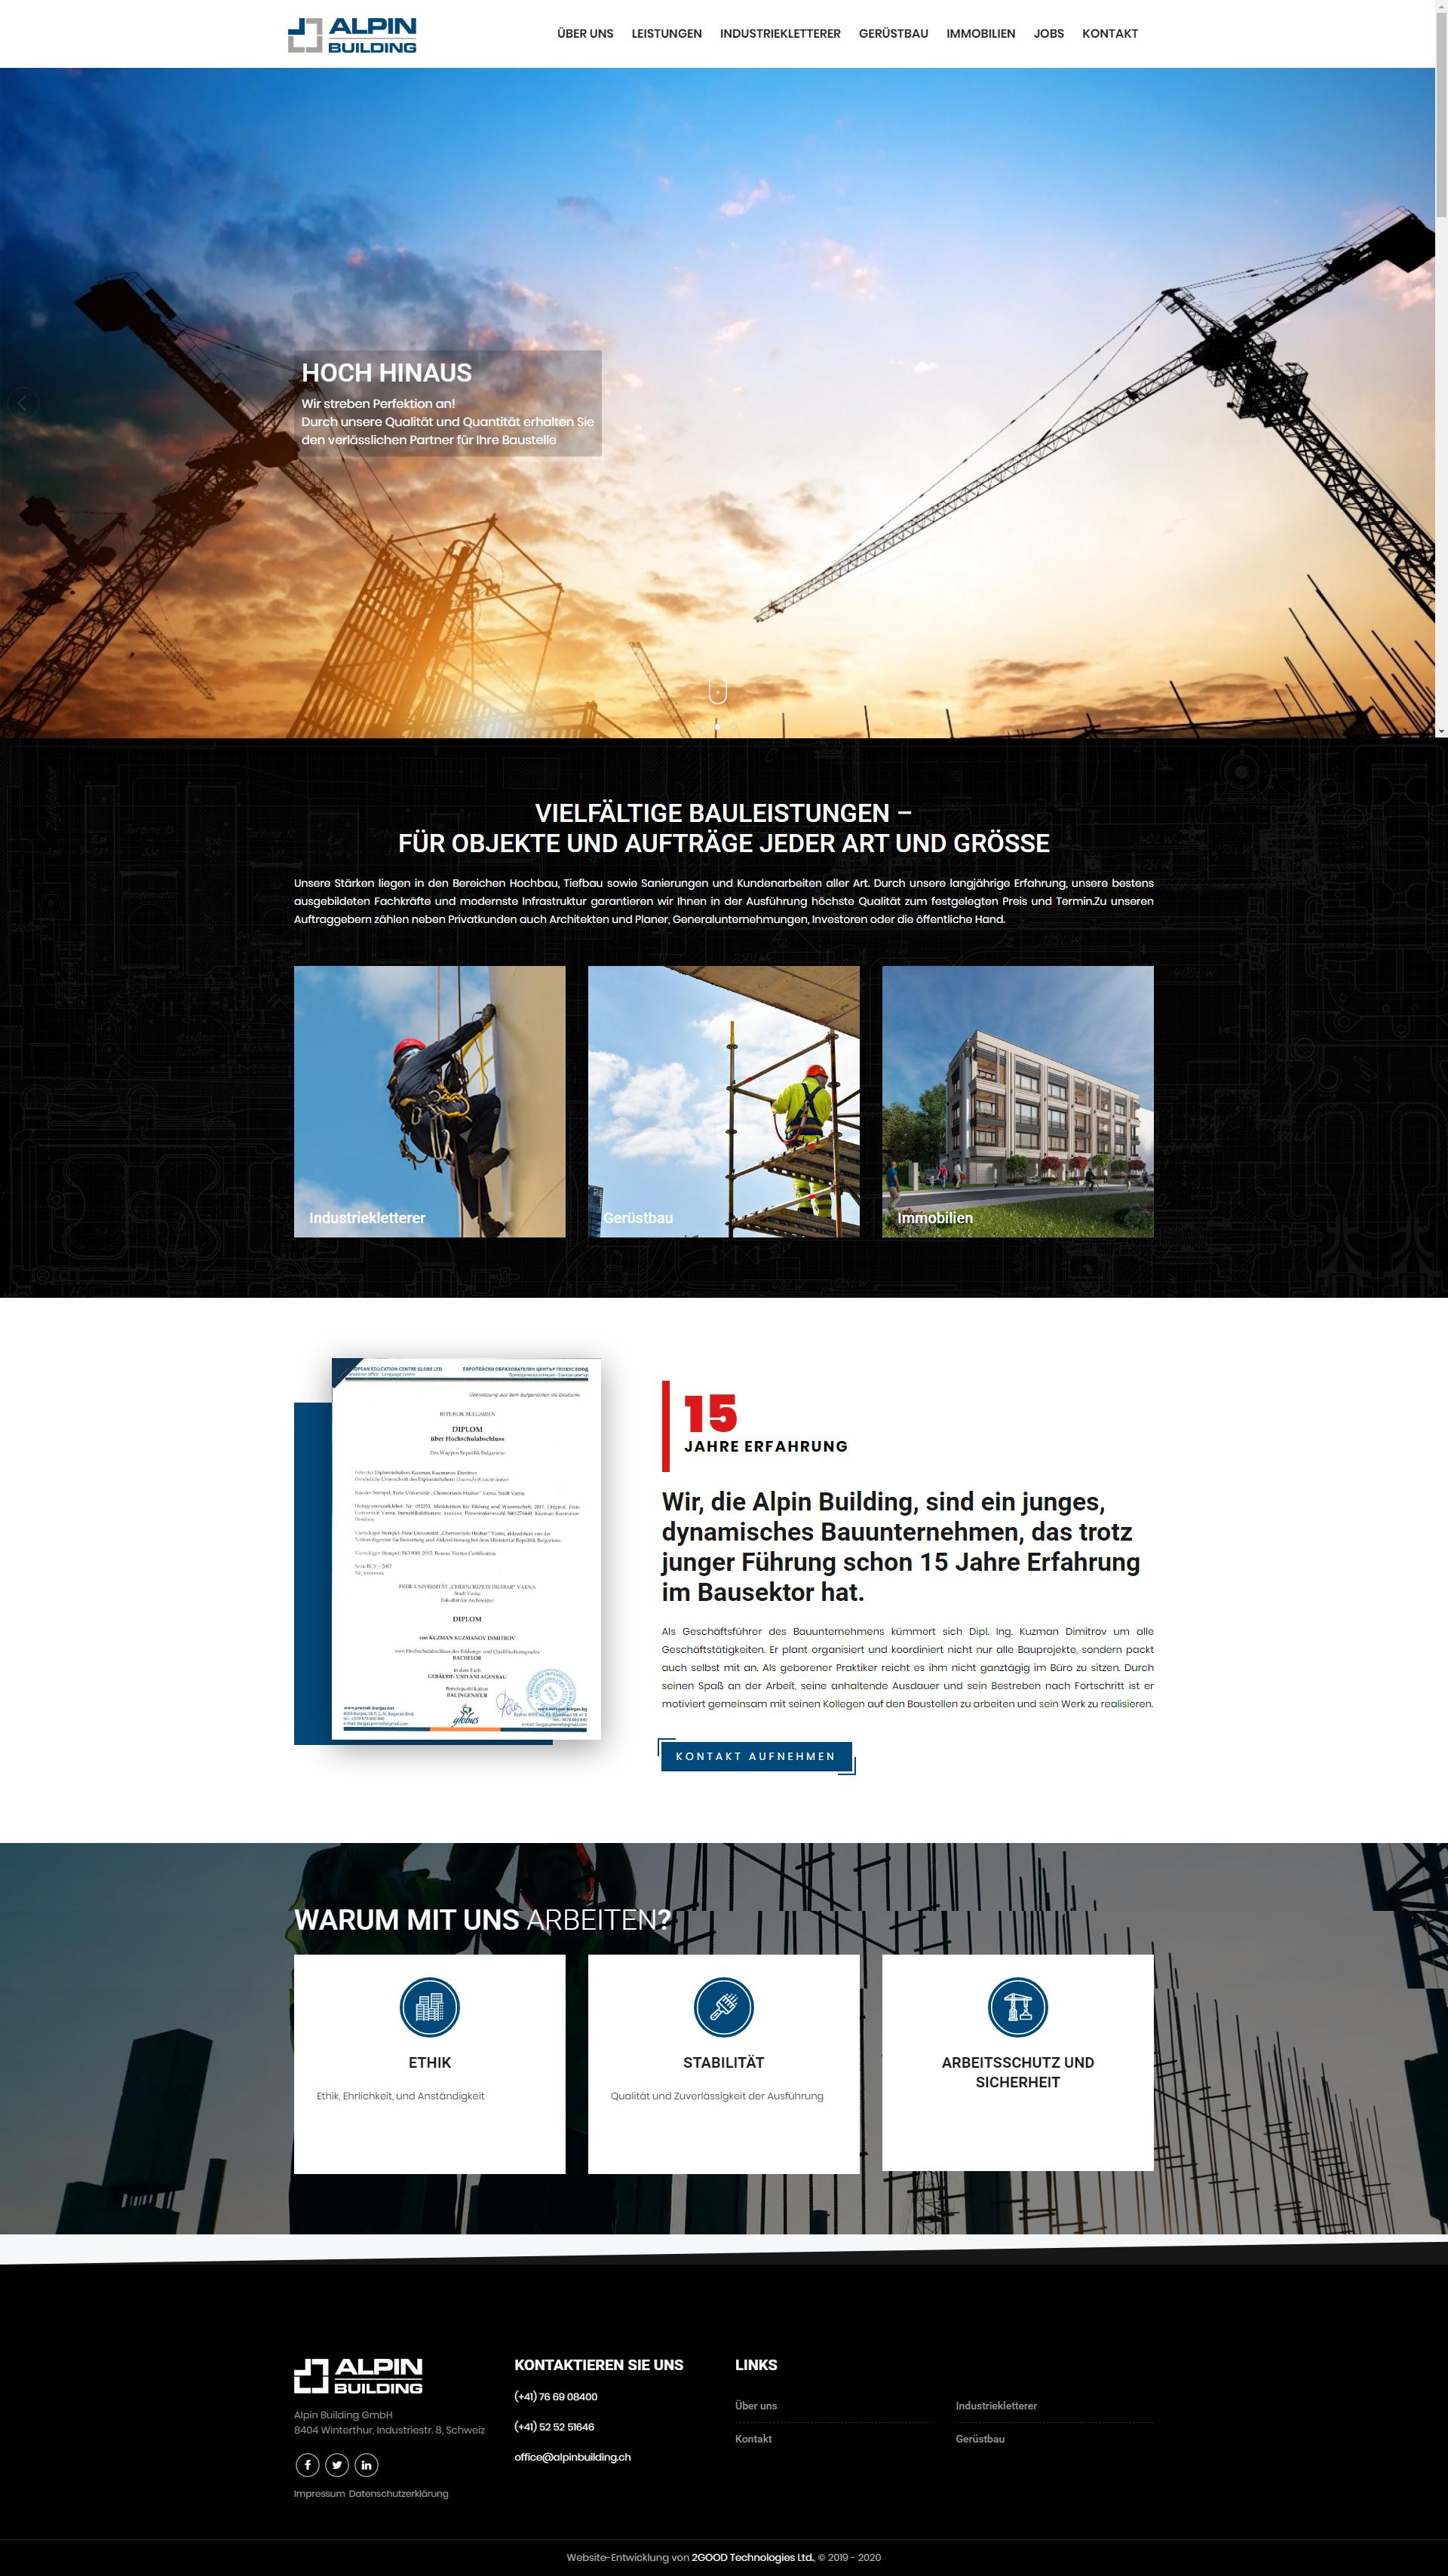 Изработка на сайт за Алпин Билдинг